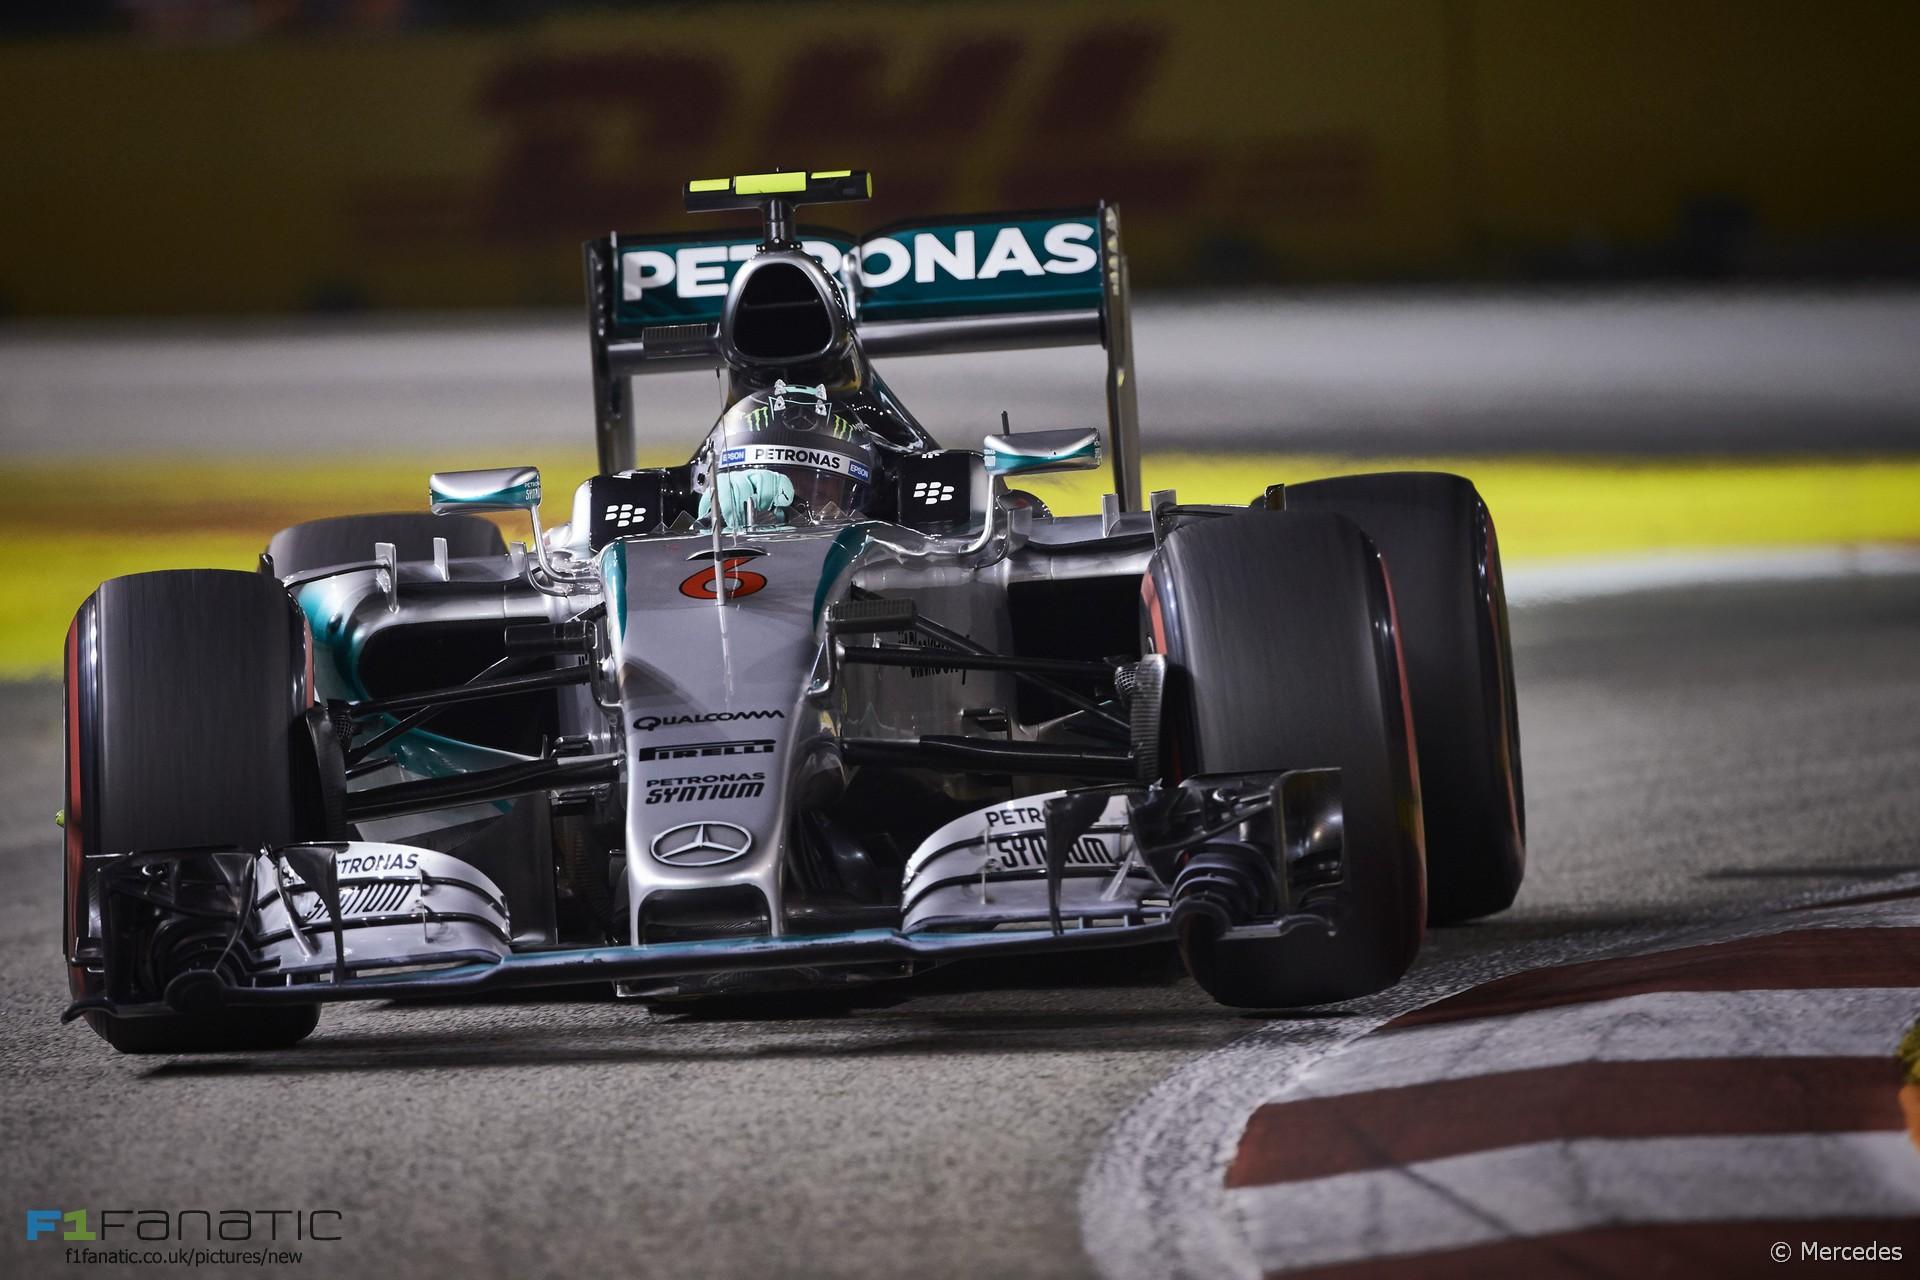 Nico rosberg mercedes singapore 2015 f1 fanatic for Mercedes benz long beach service department